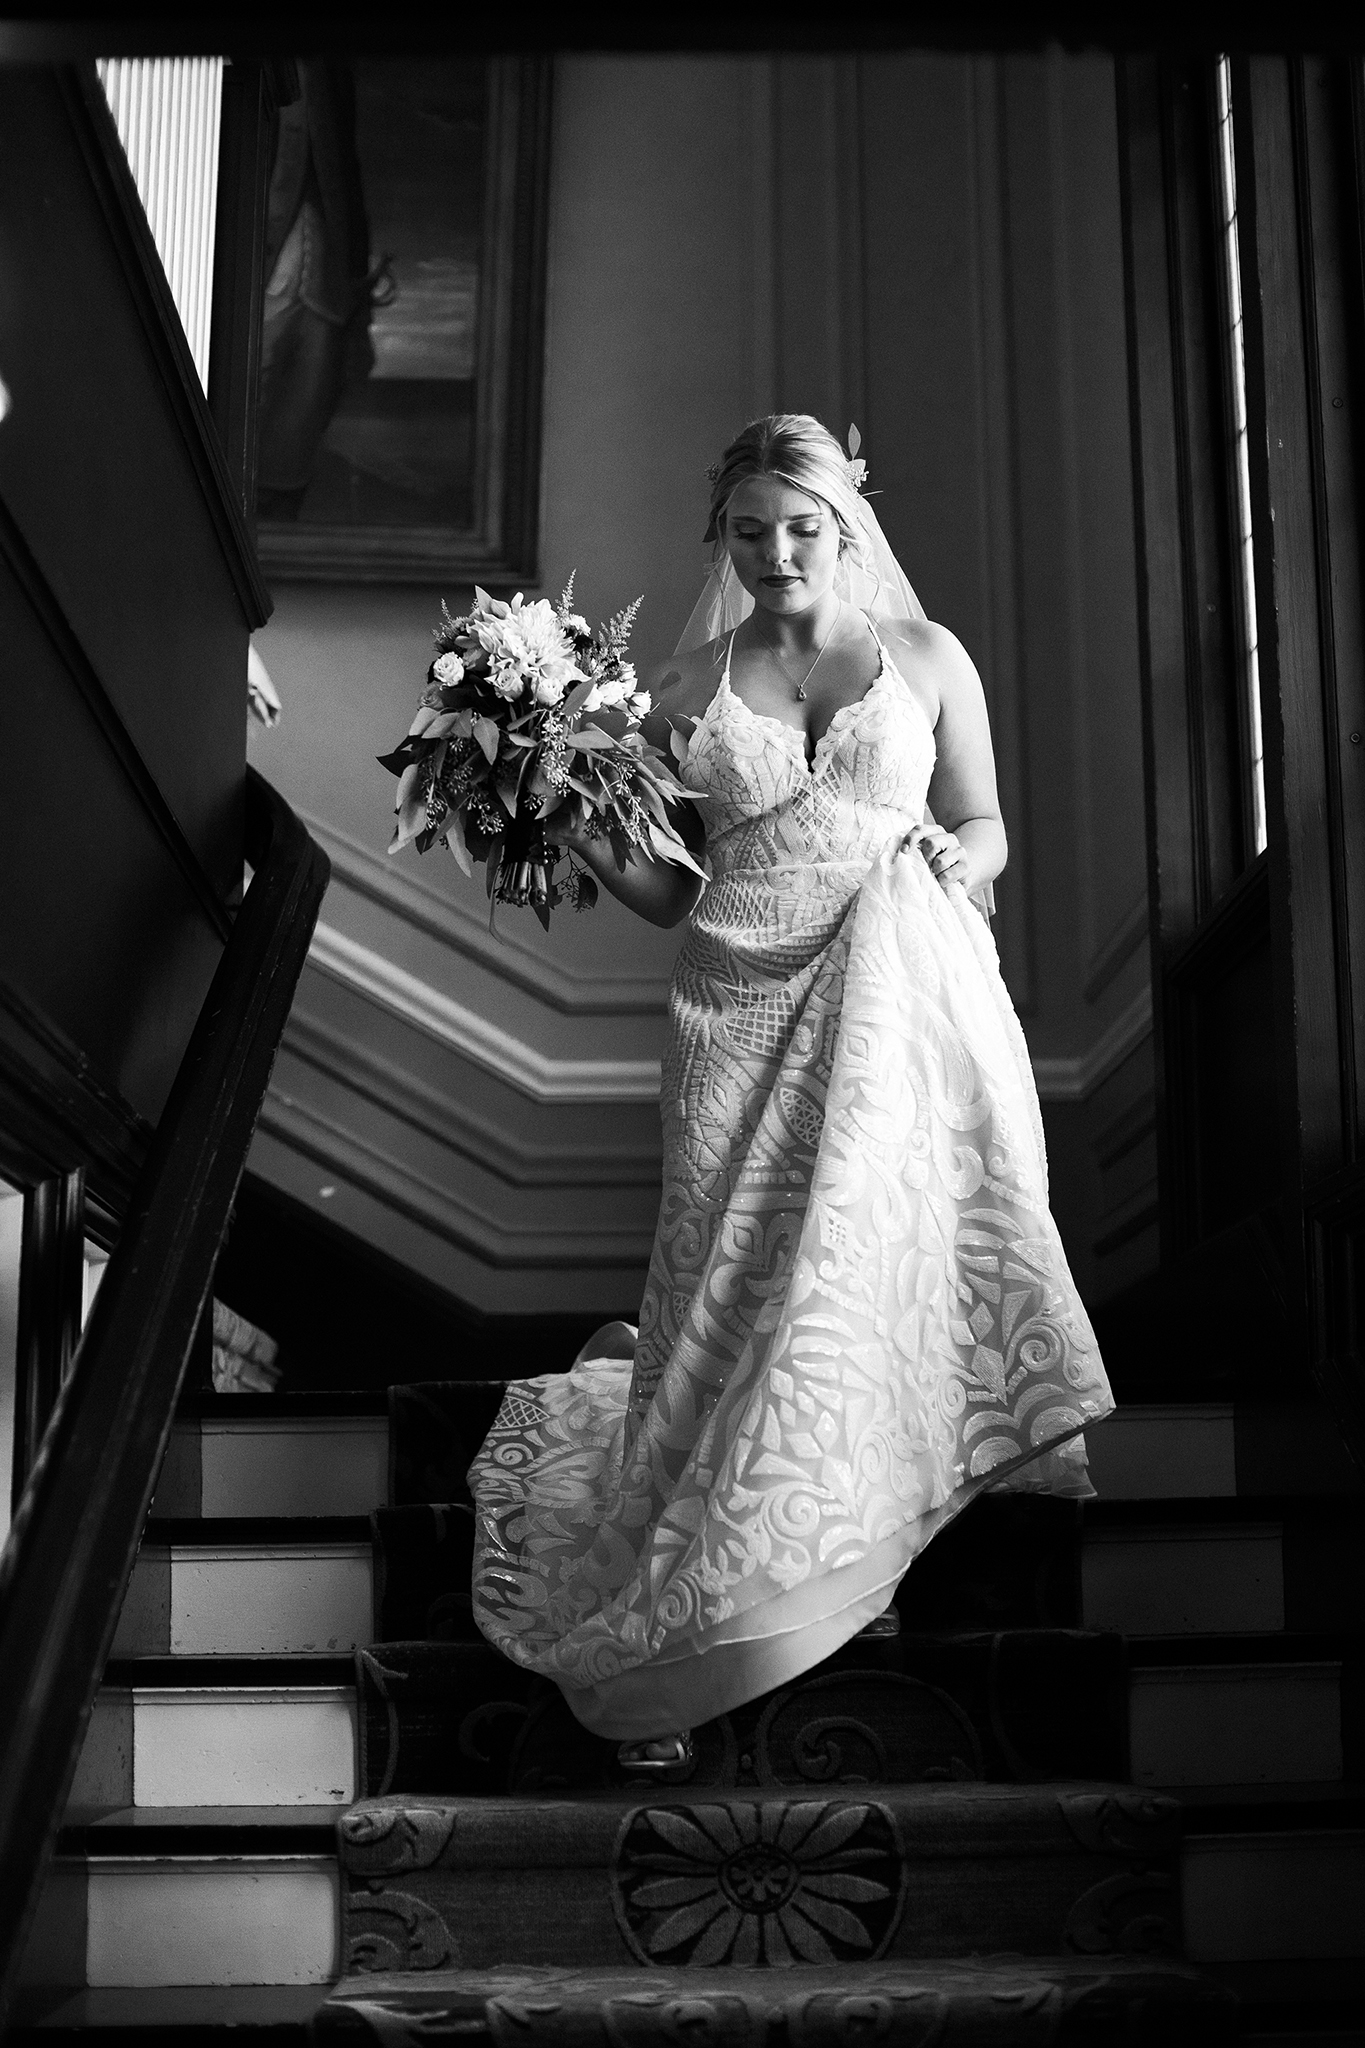 traverse_city_wedding_photographer_rockhill_stonecliffe_mackinac_Island_ajg_1.jpg